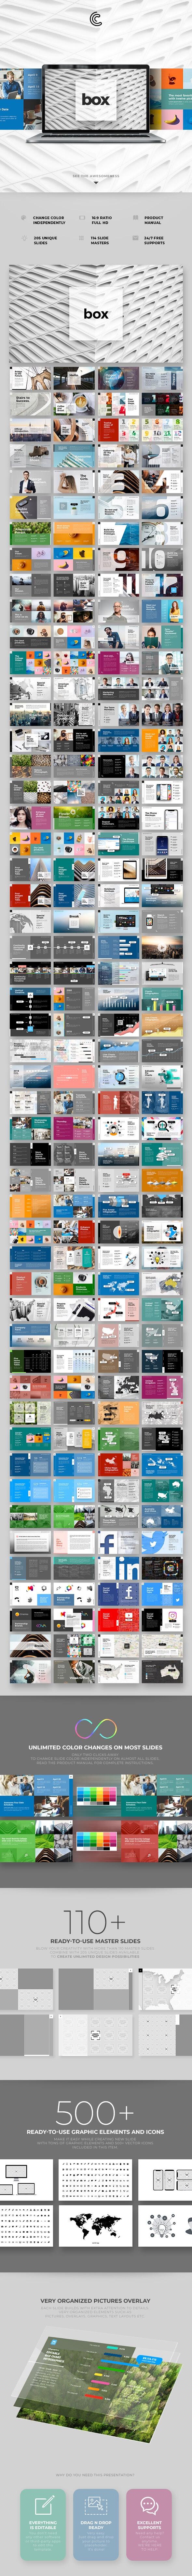 Box PowerPoint - PowerPoint Templates Presentation Templates